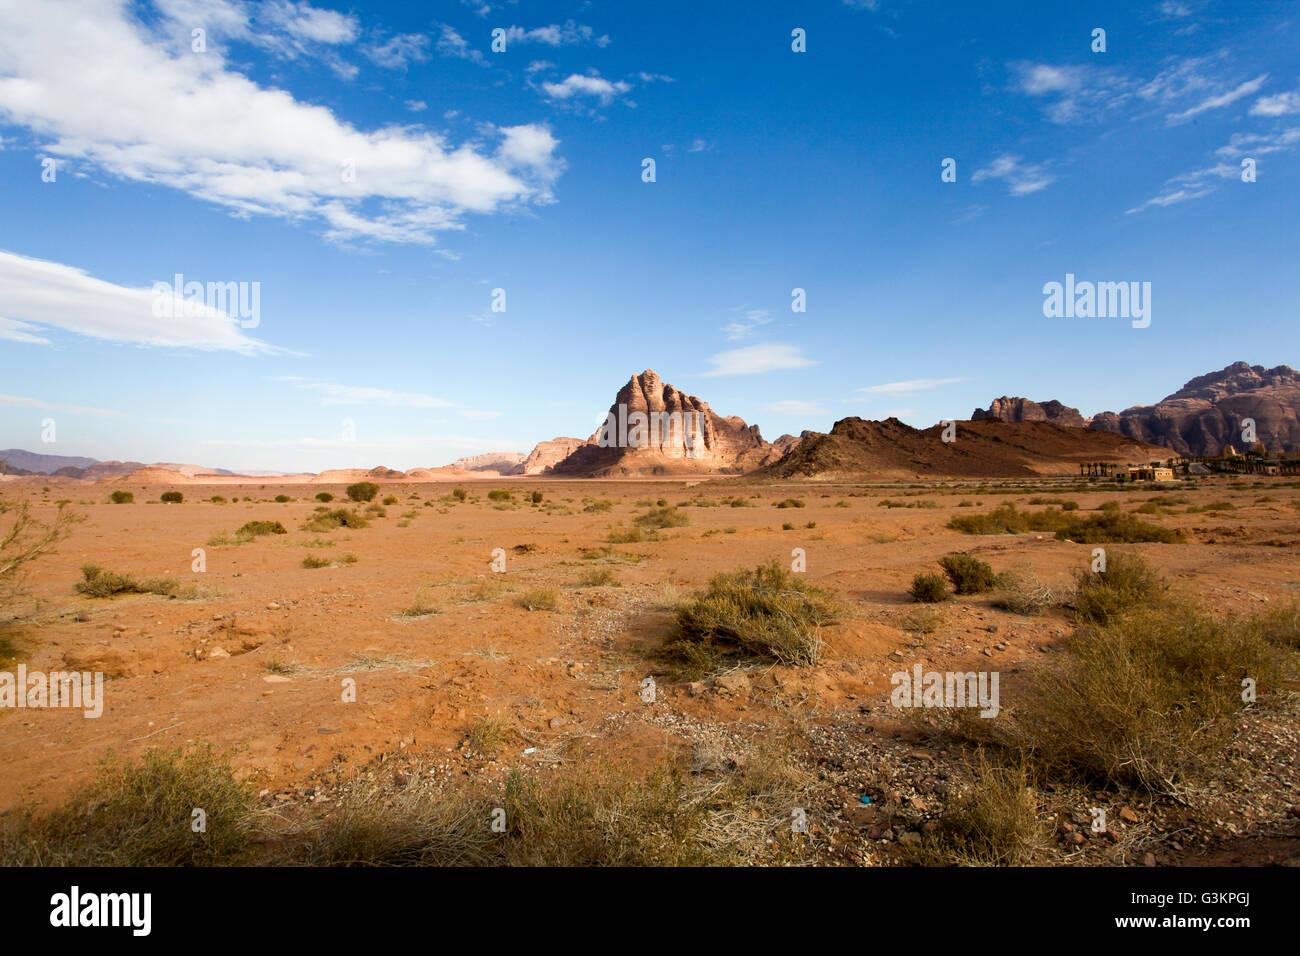 Paysage désertique, Wadi Rum, Jordanie Photo Stock